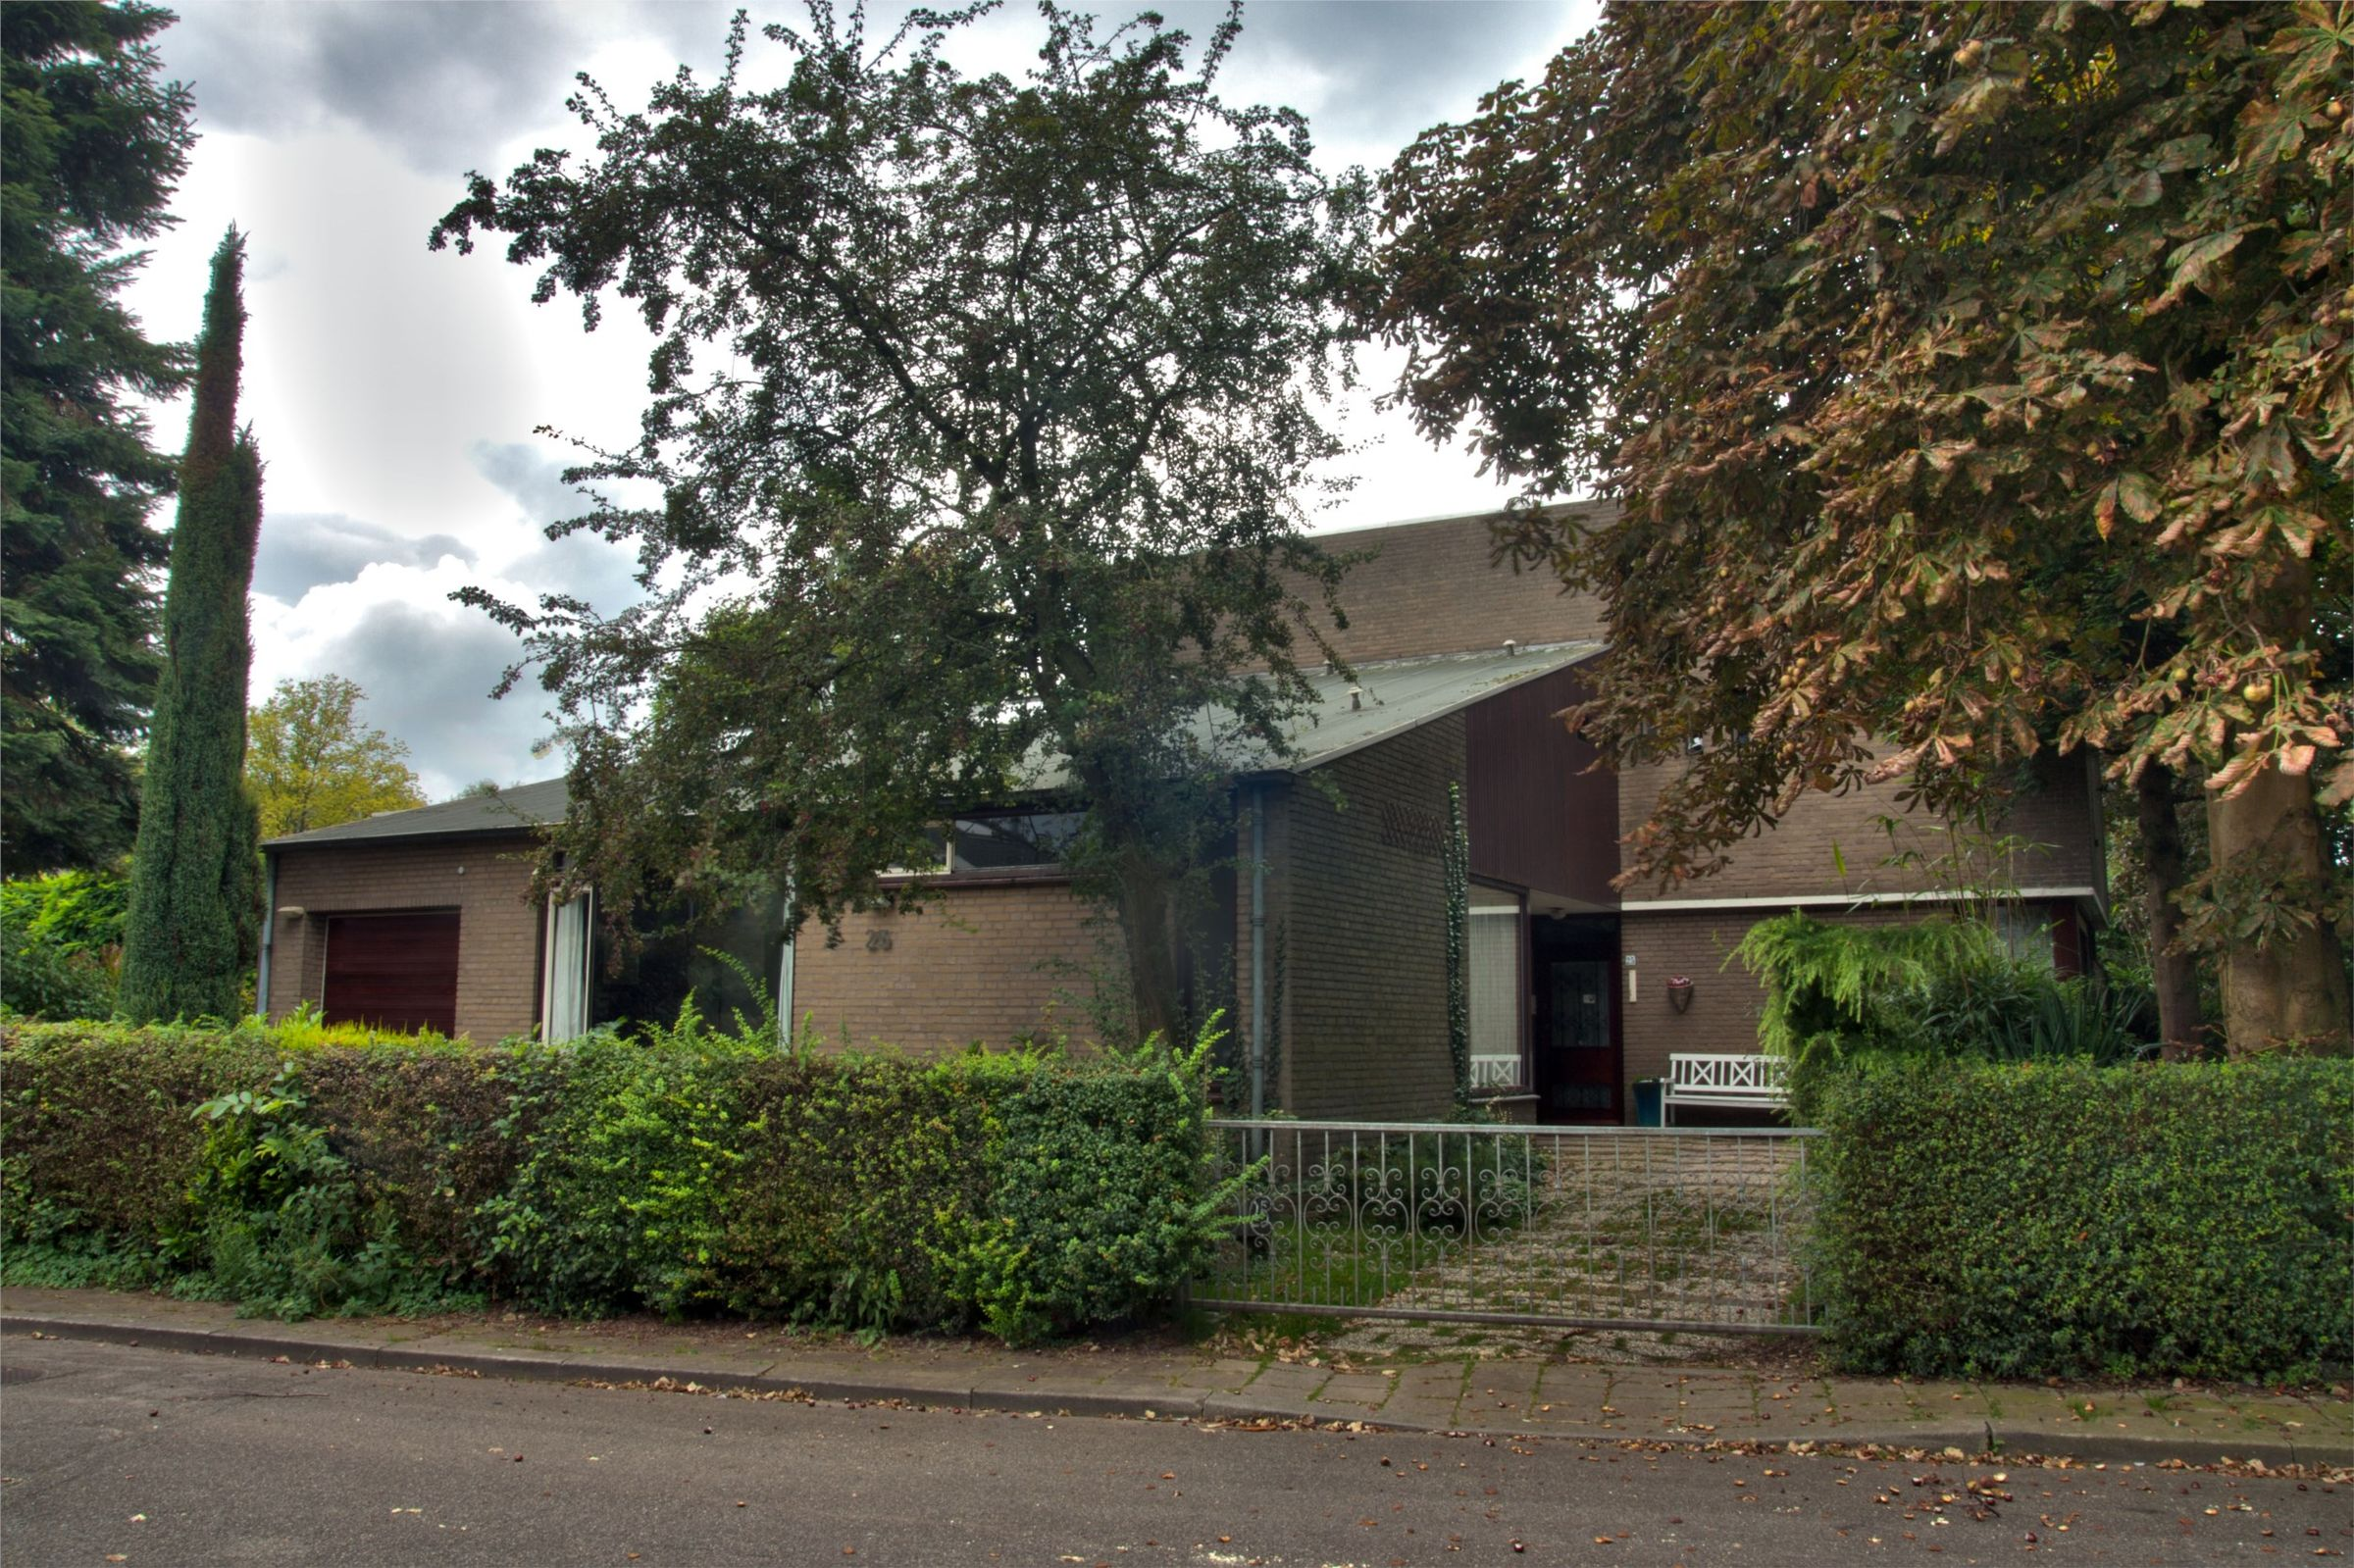 Eimerssingel-Oost 25, Arnhem